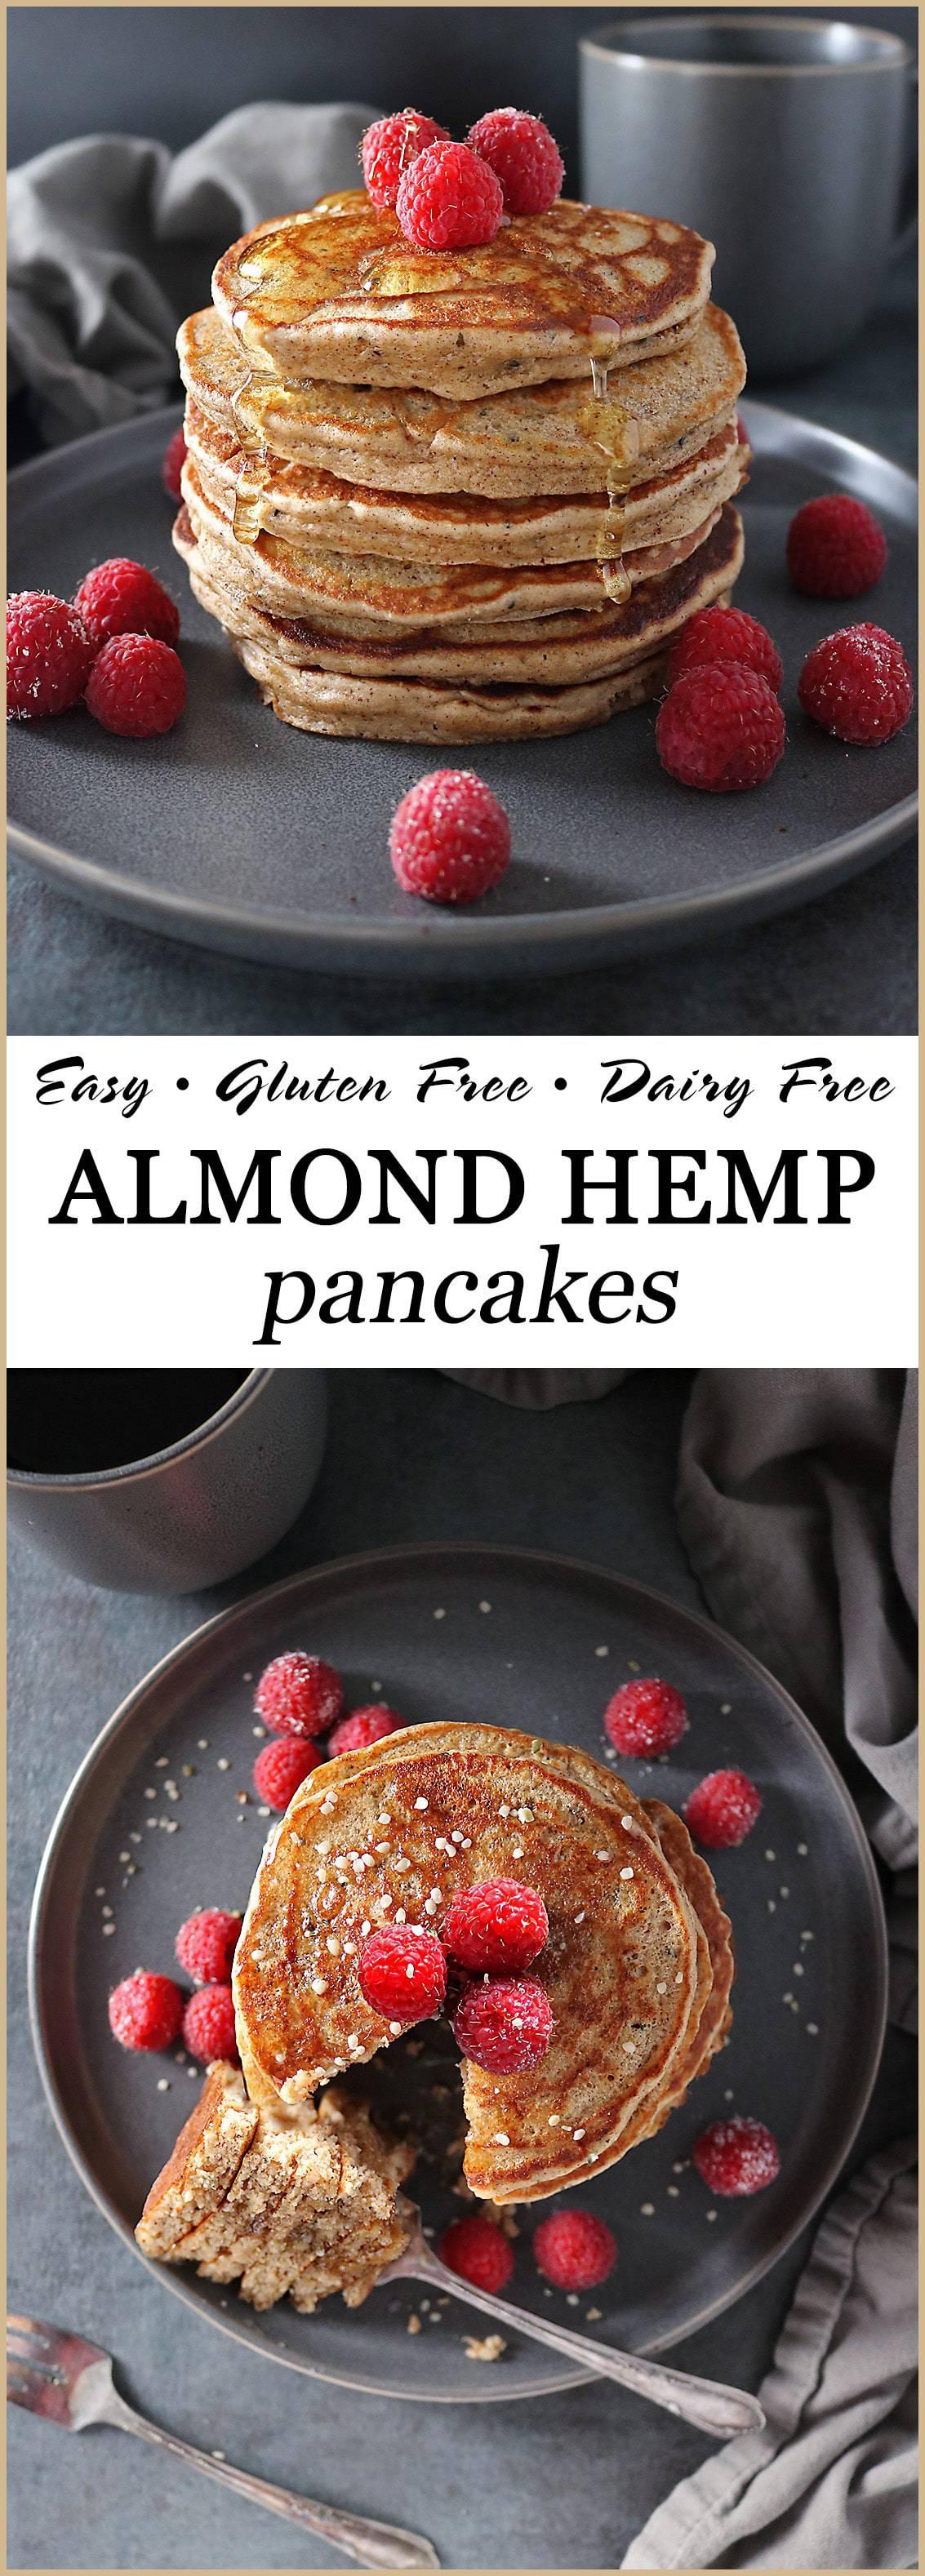 Easy, Gluten Free, Dairy Free, Almond Hemp Pancakes.